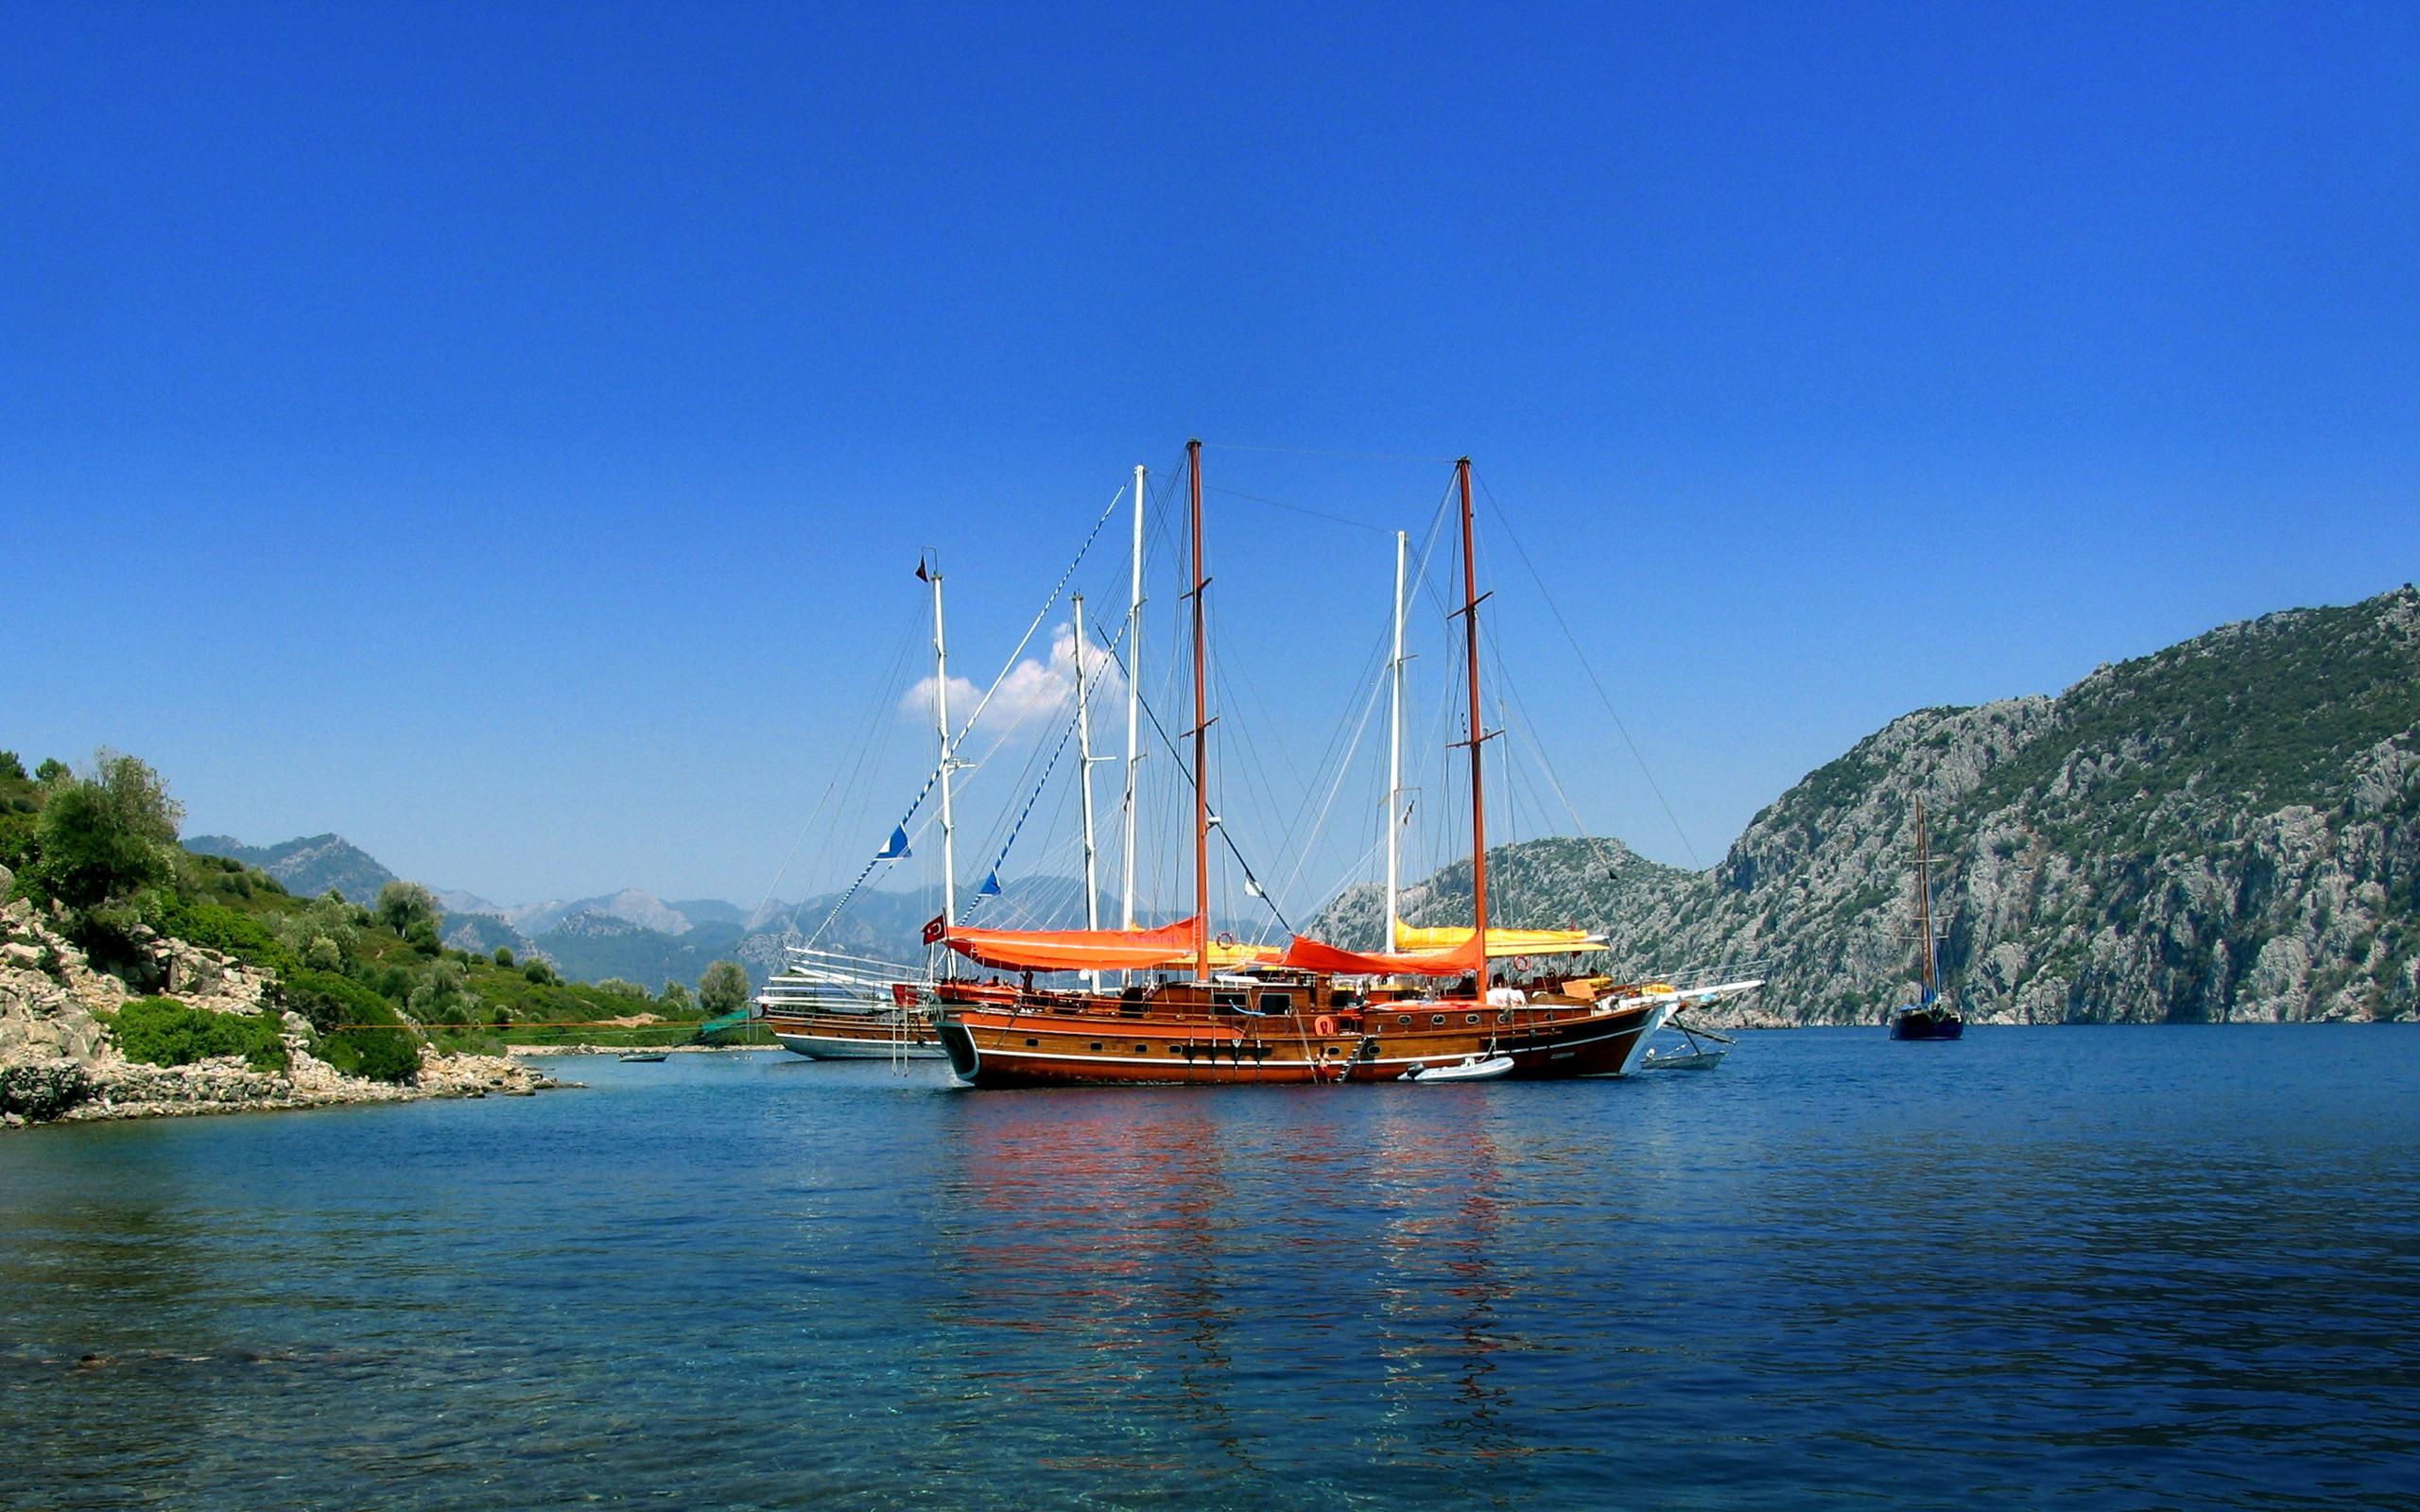 Sailing Ship Widescreen Wallpaper